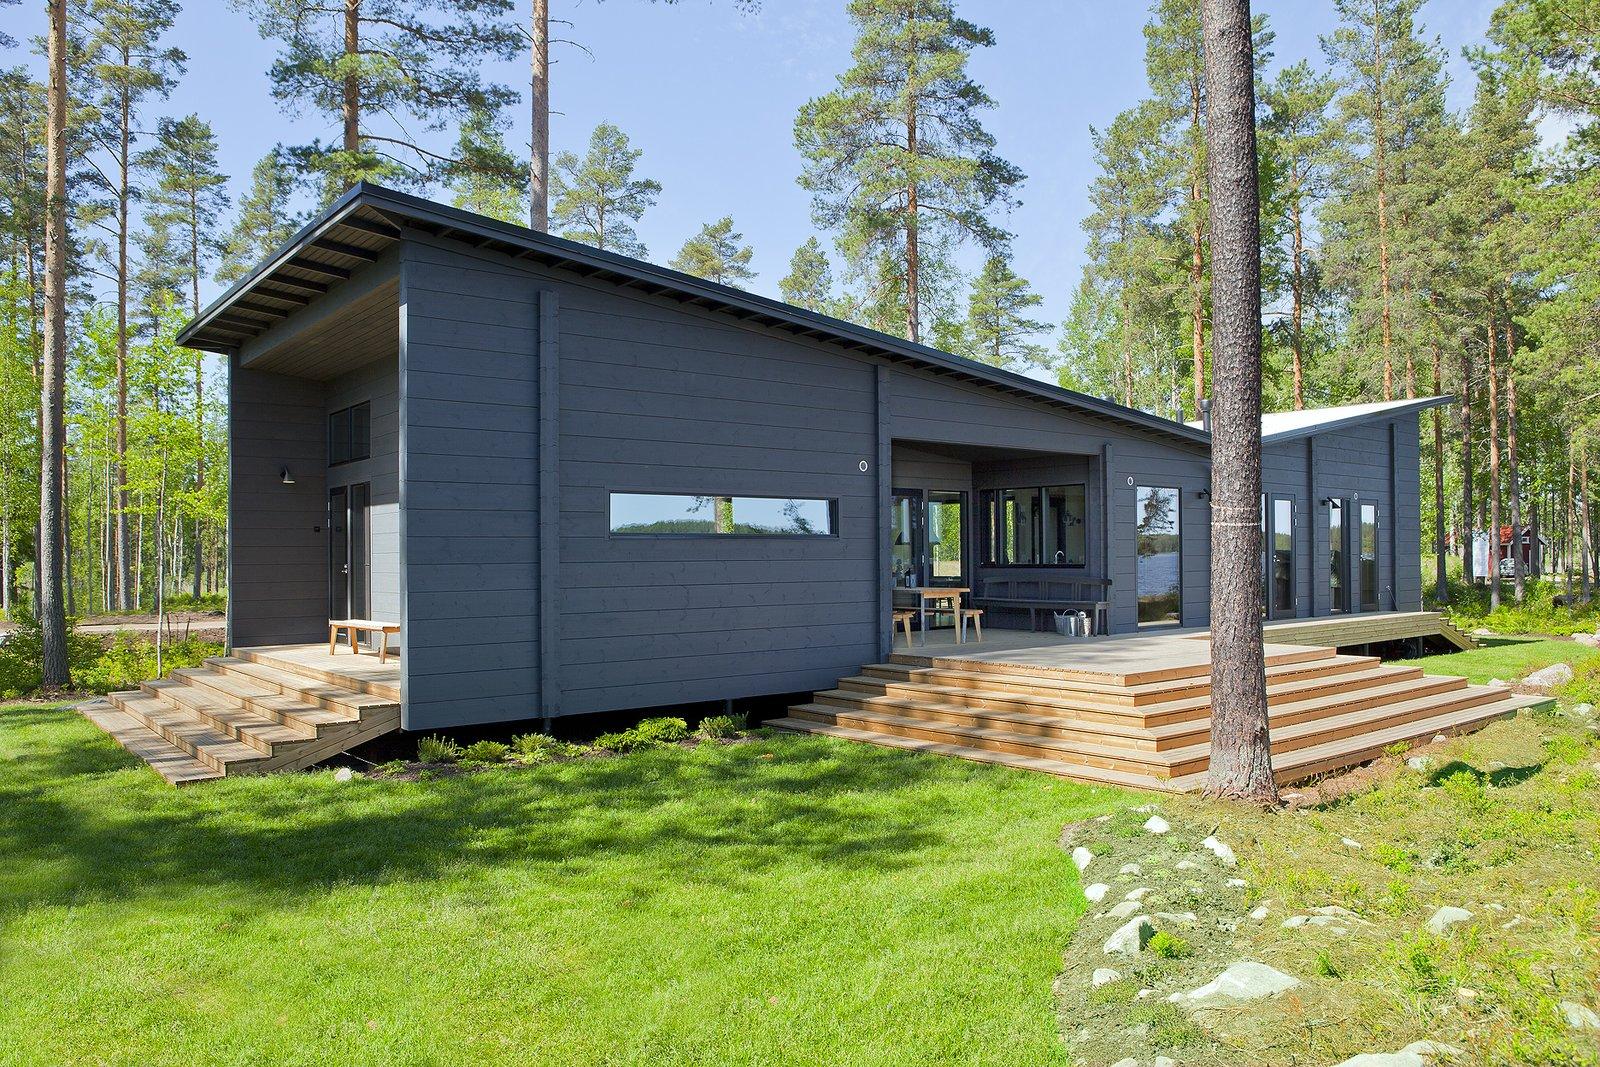 These 8 Log Cabin Kit Homes Celebrate Nordic Minimalism